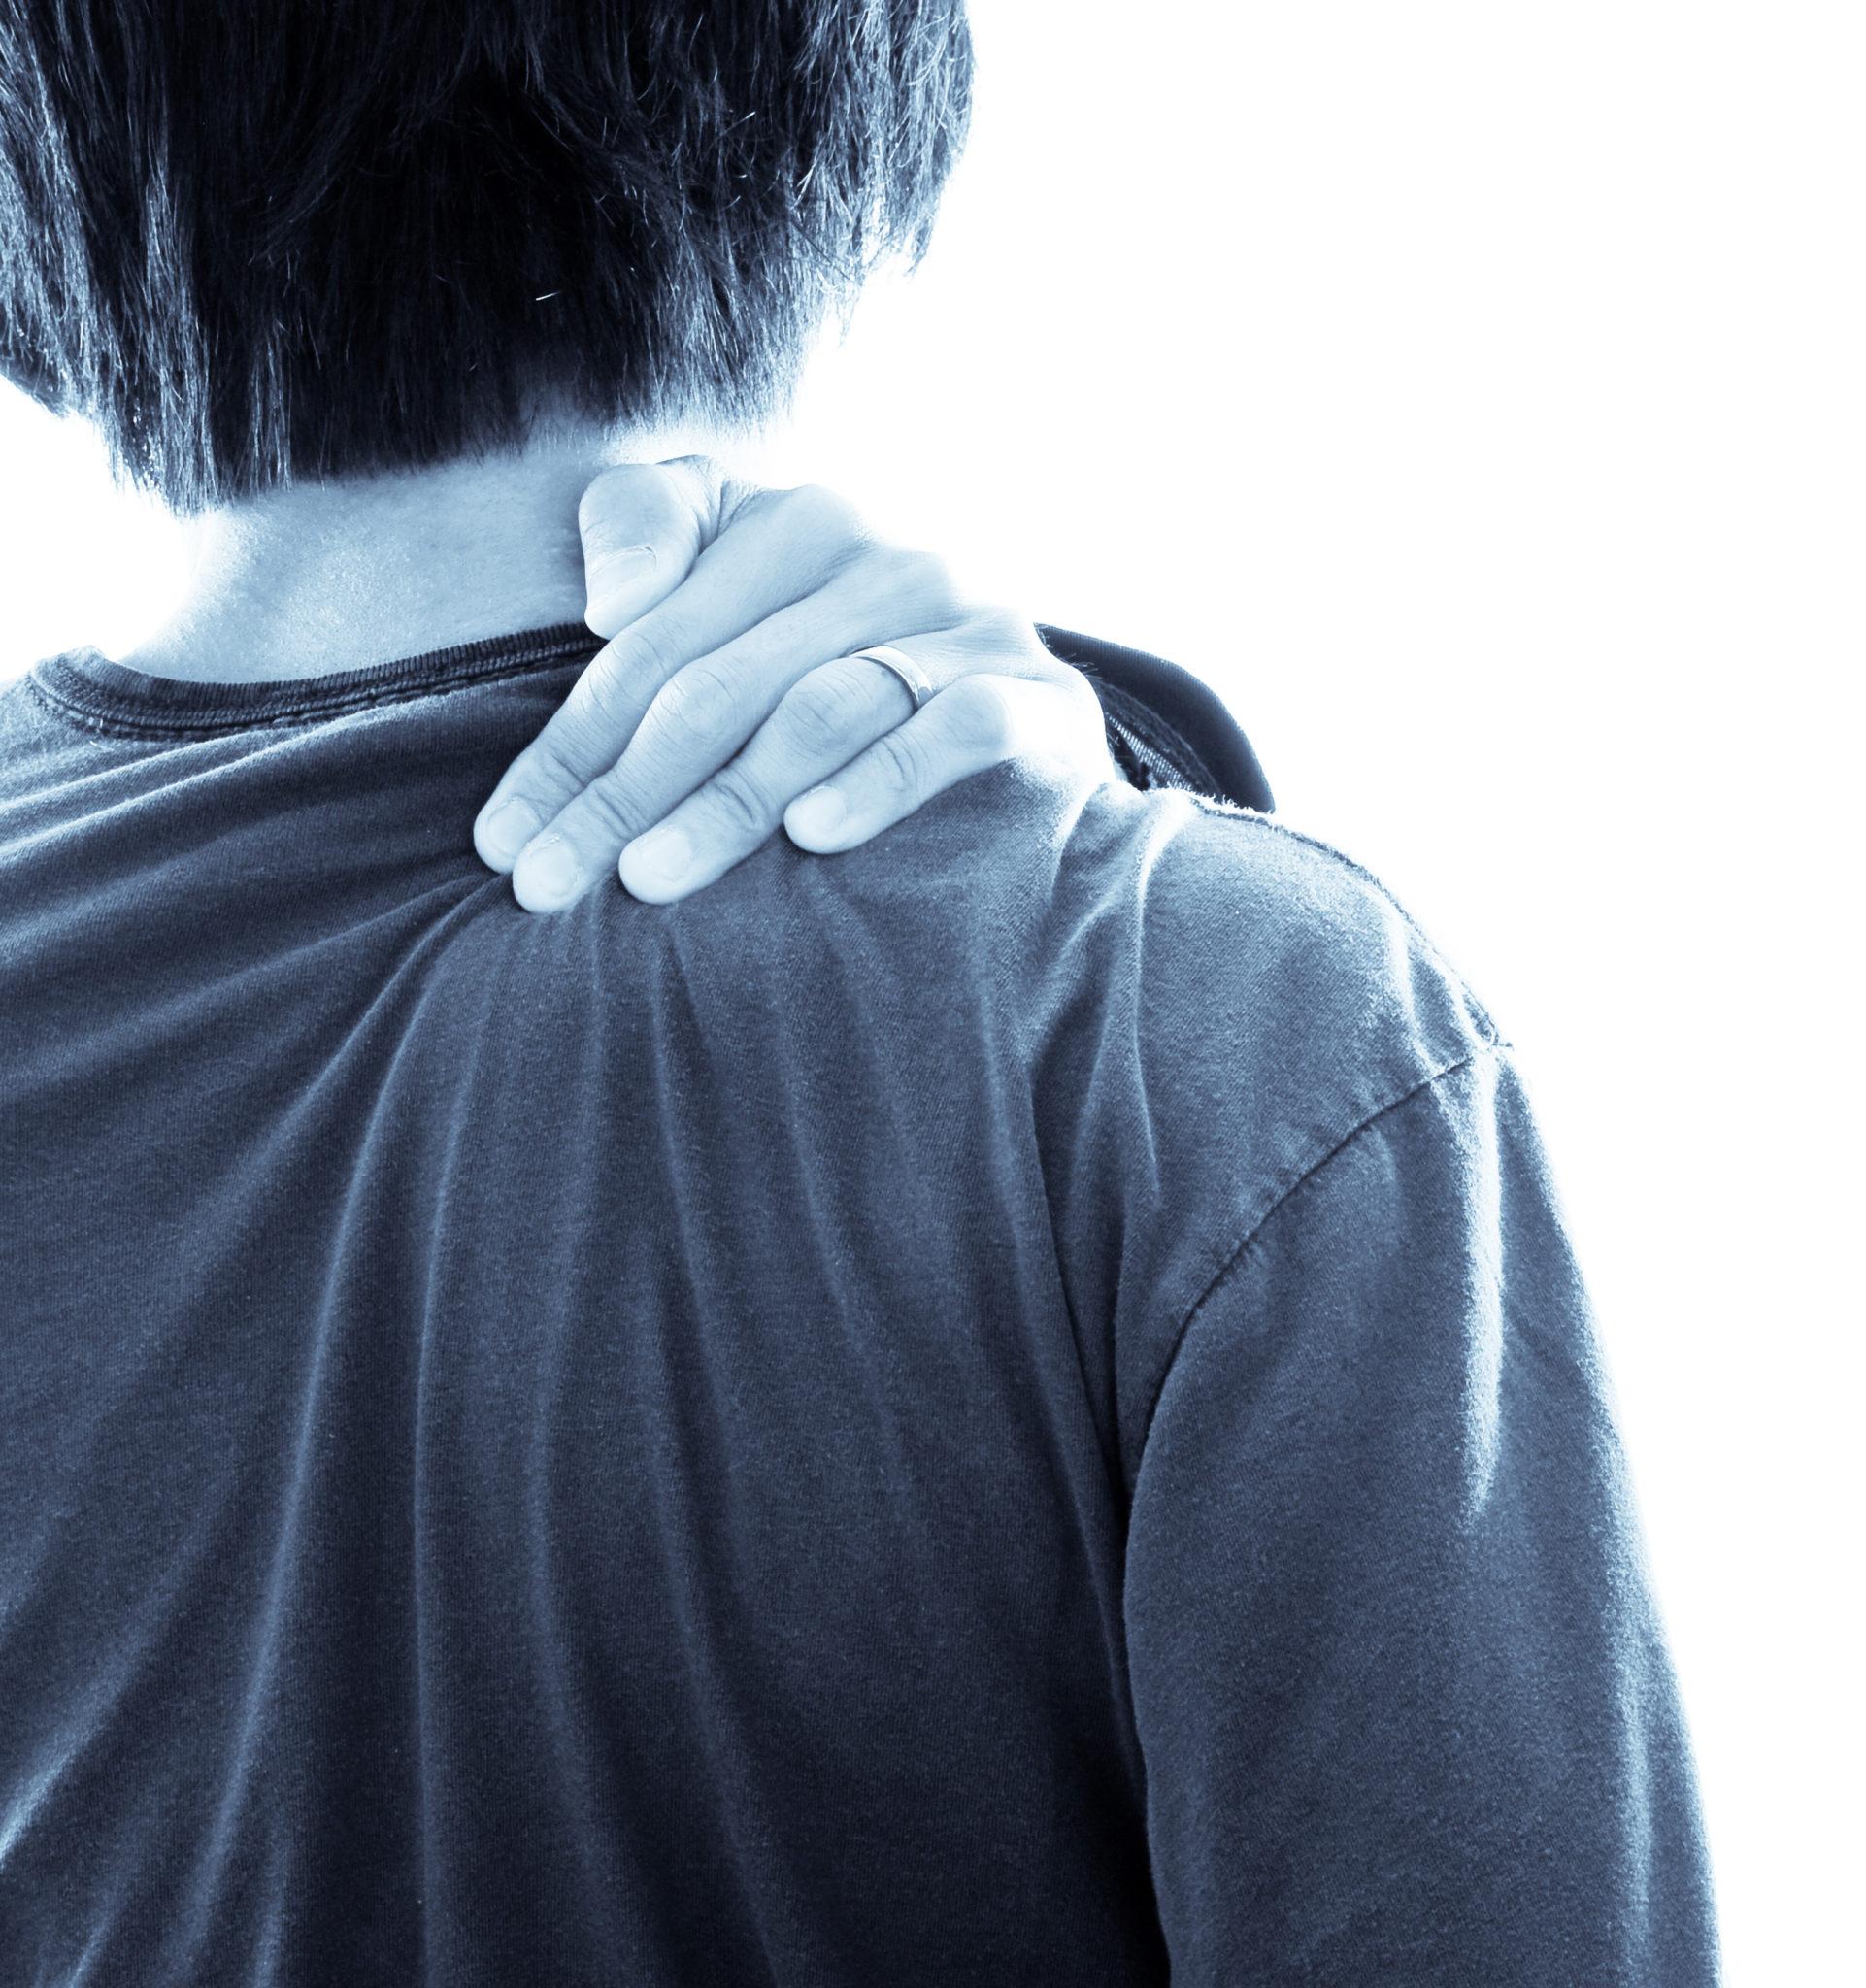 Chronic Pain? How we can help..